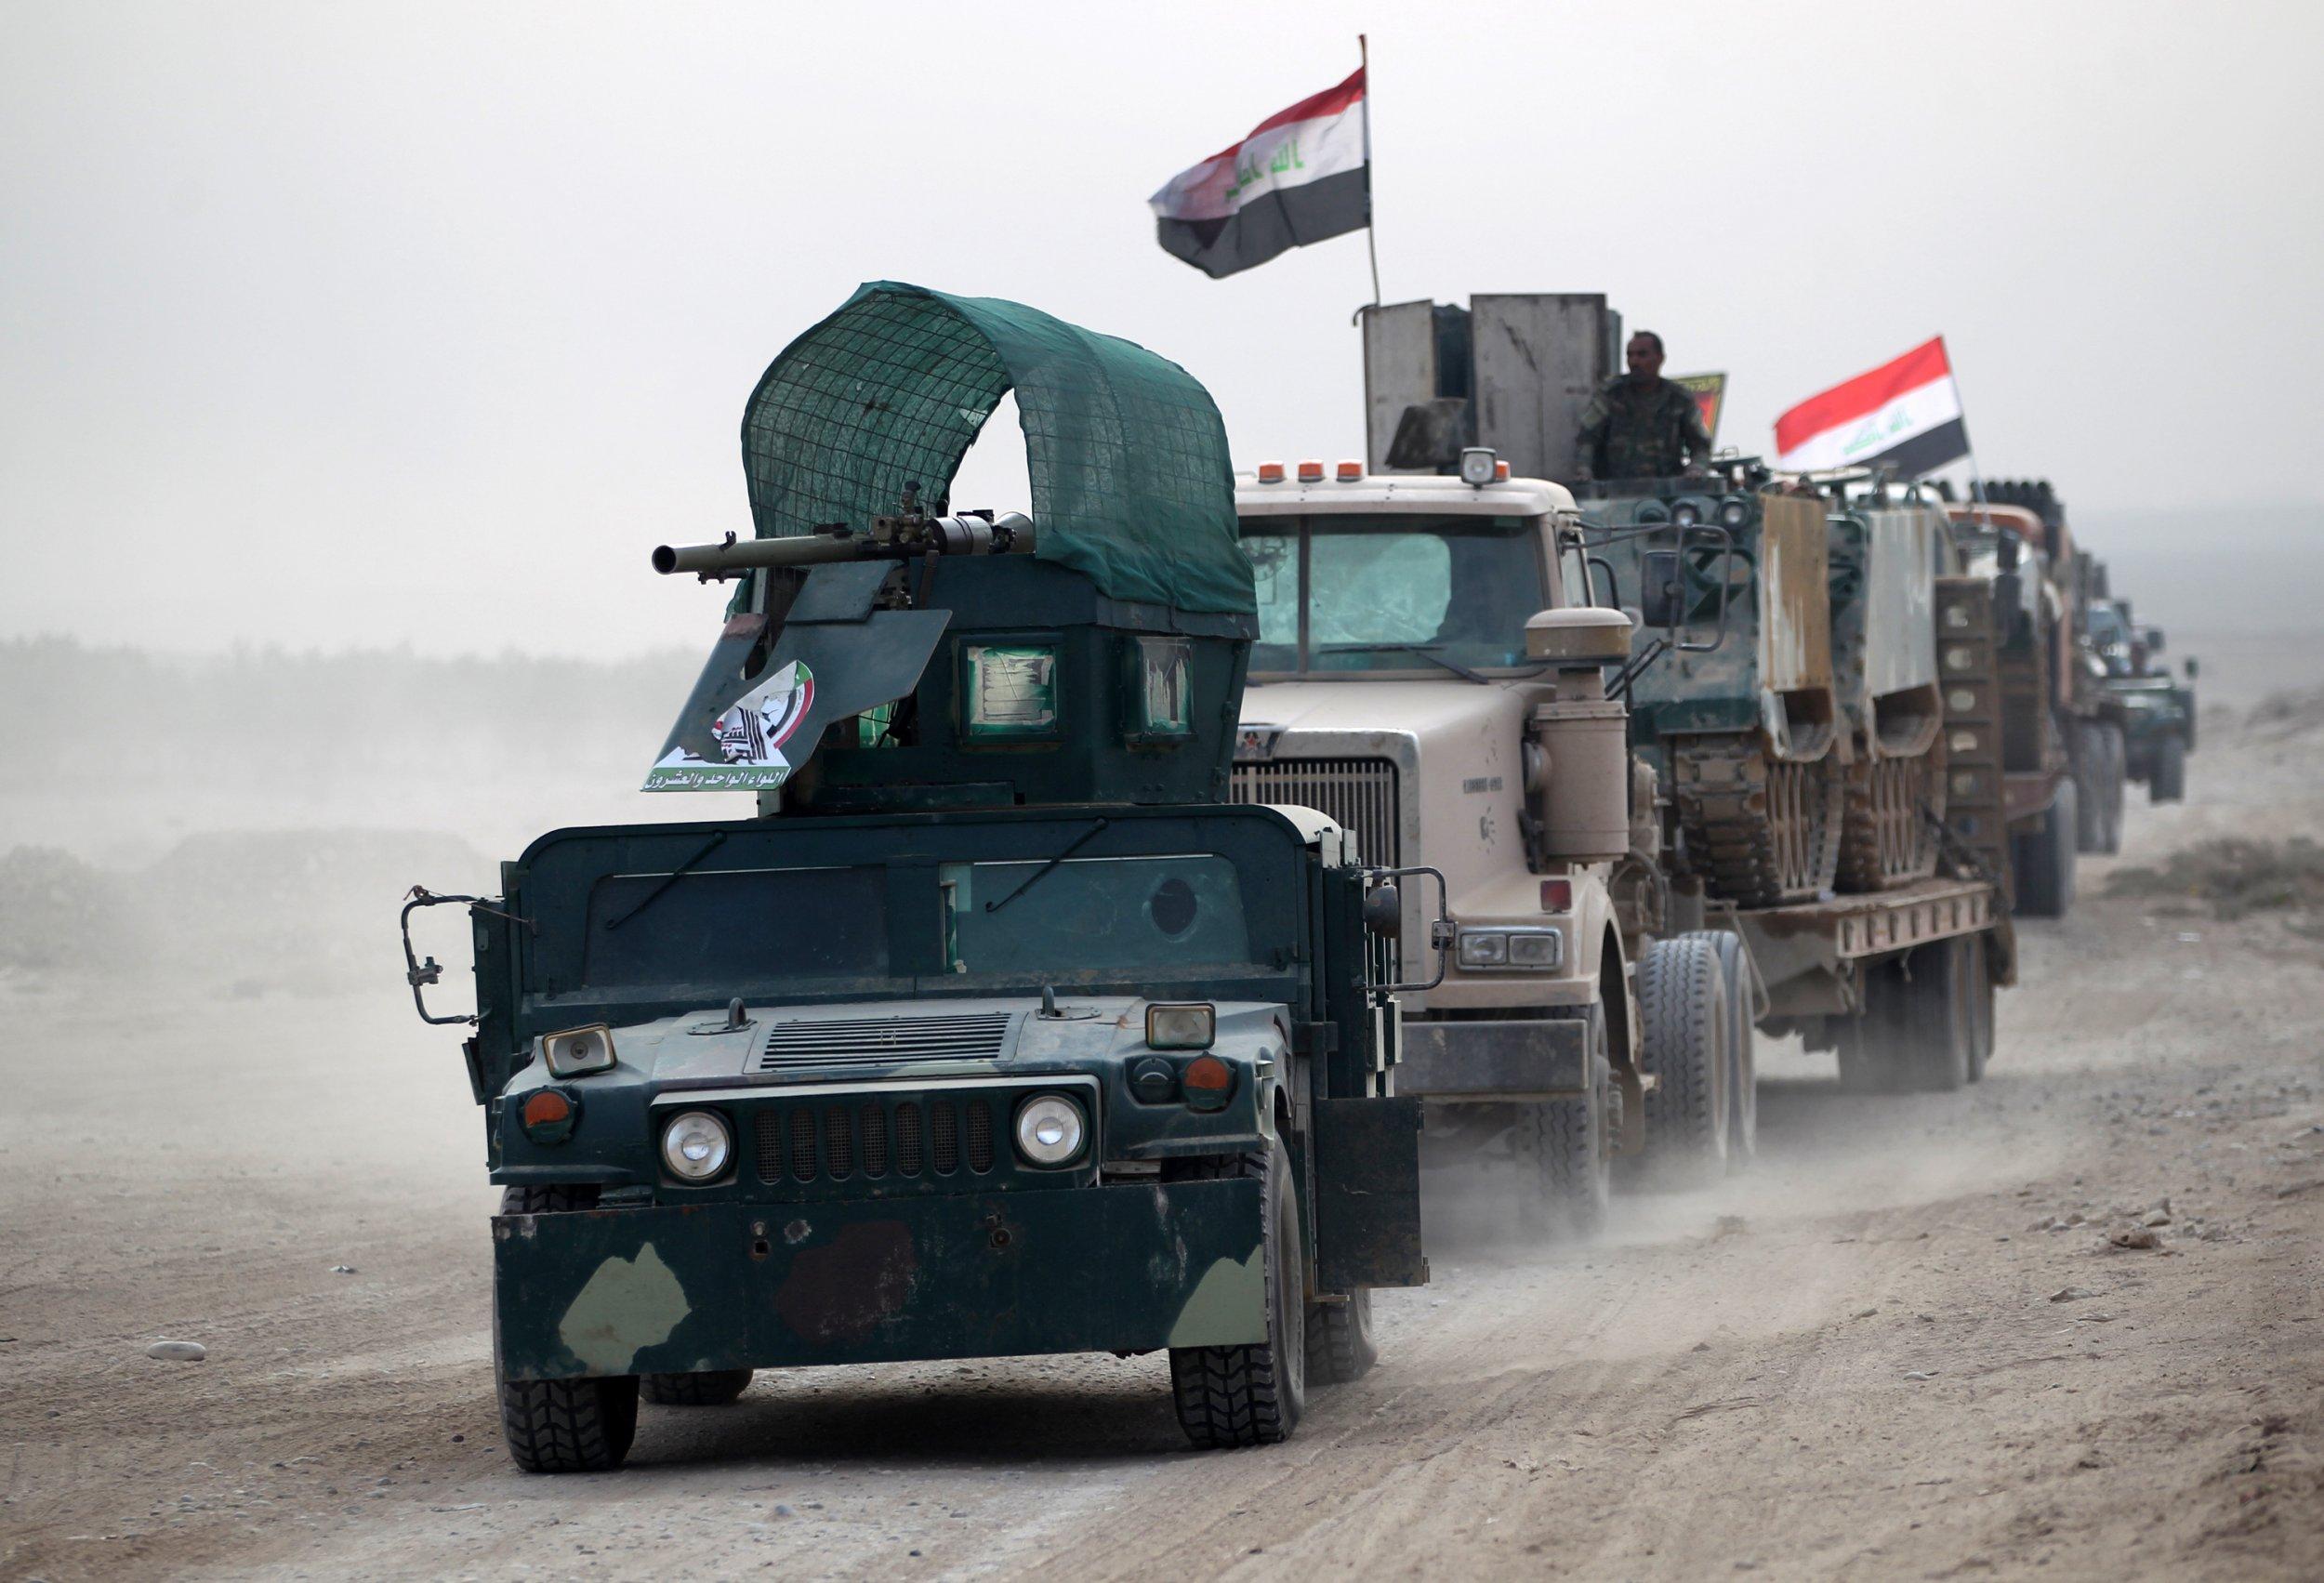 Iraqi offensive on Mosul